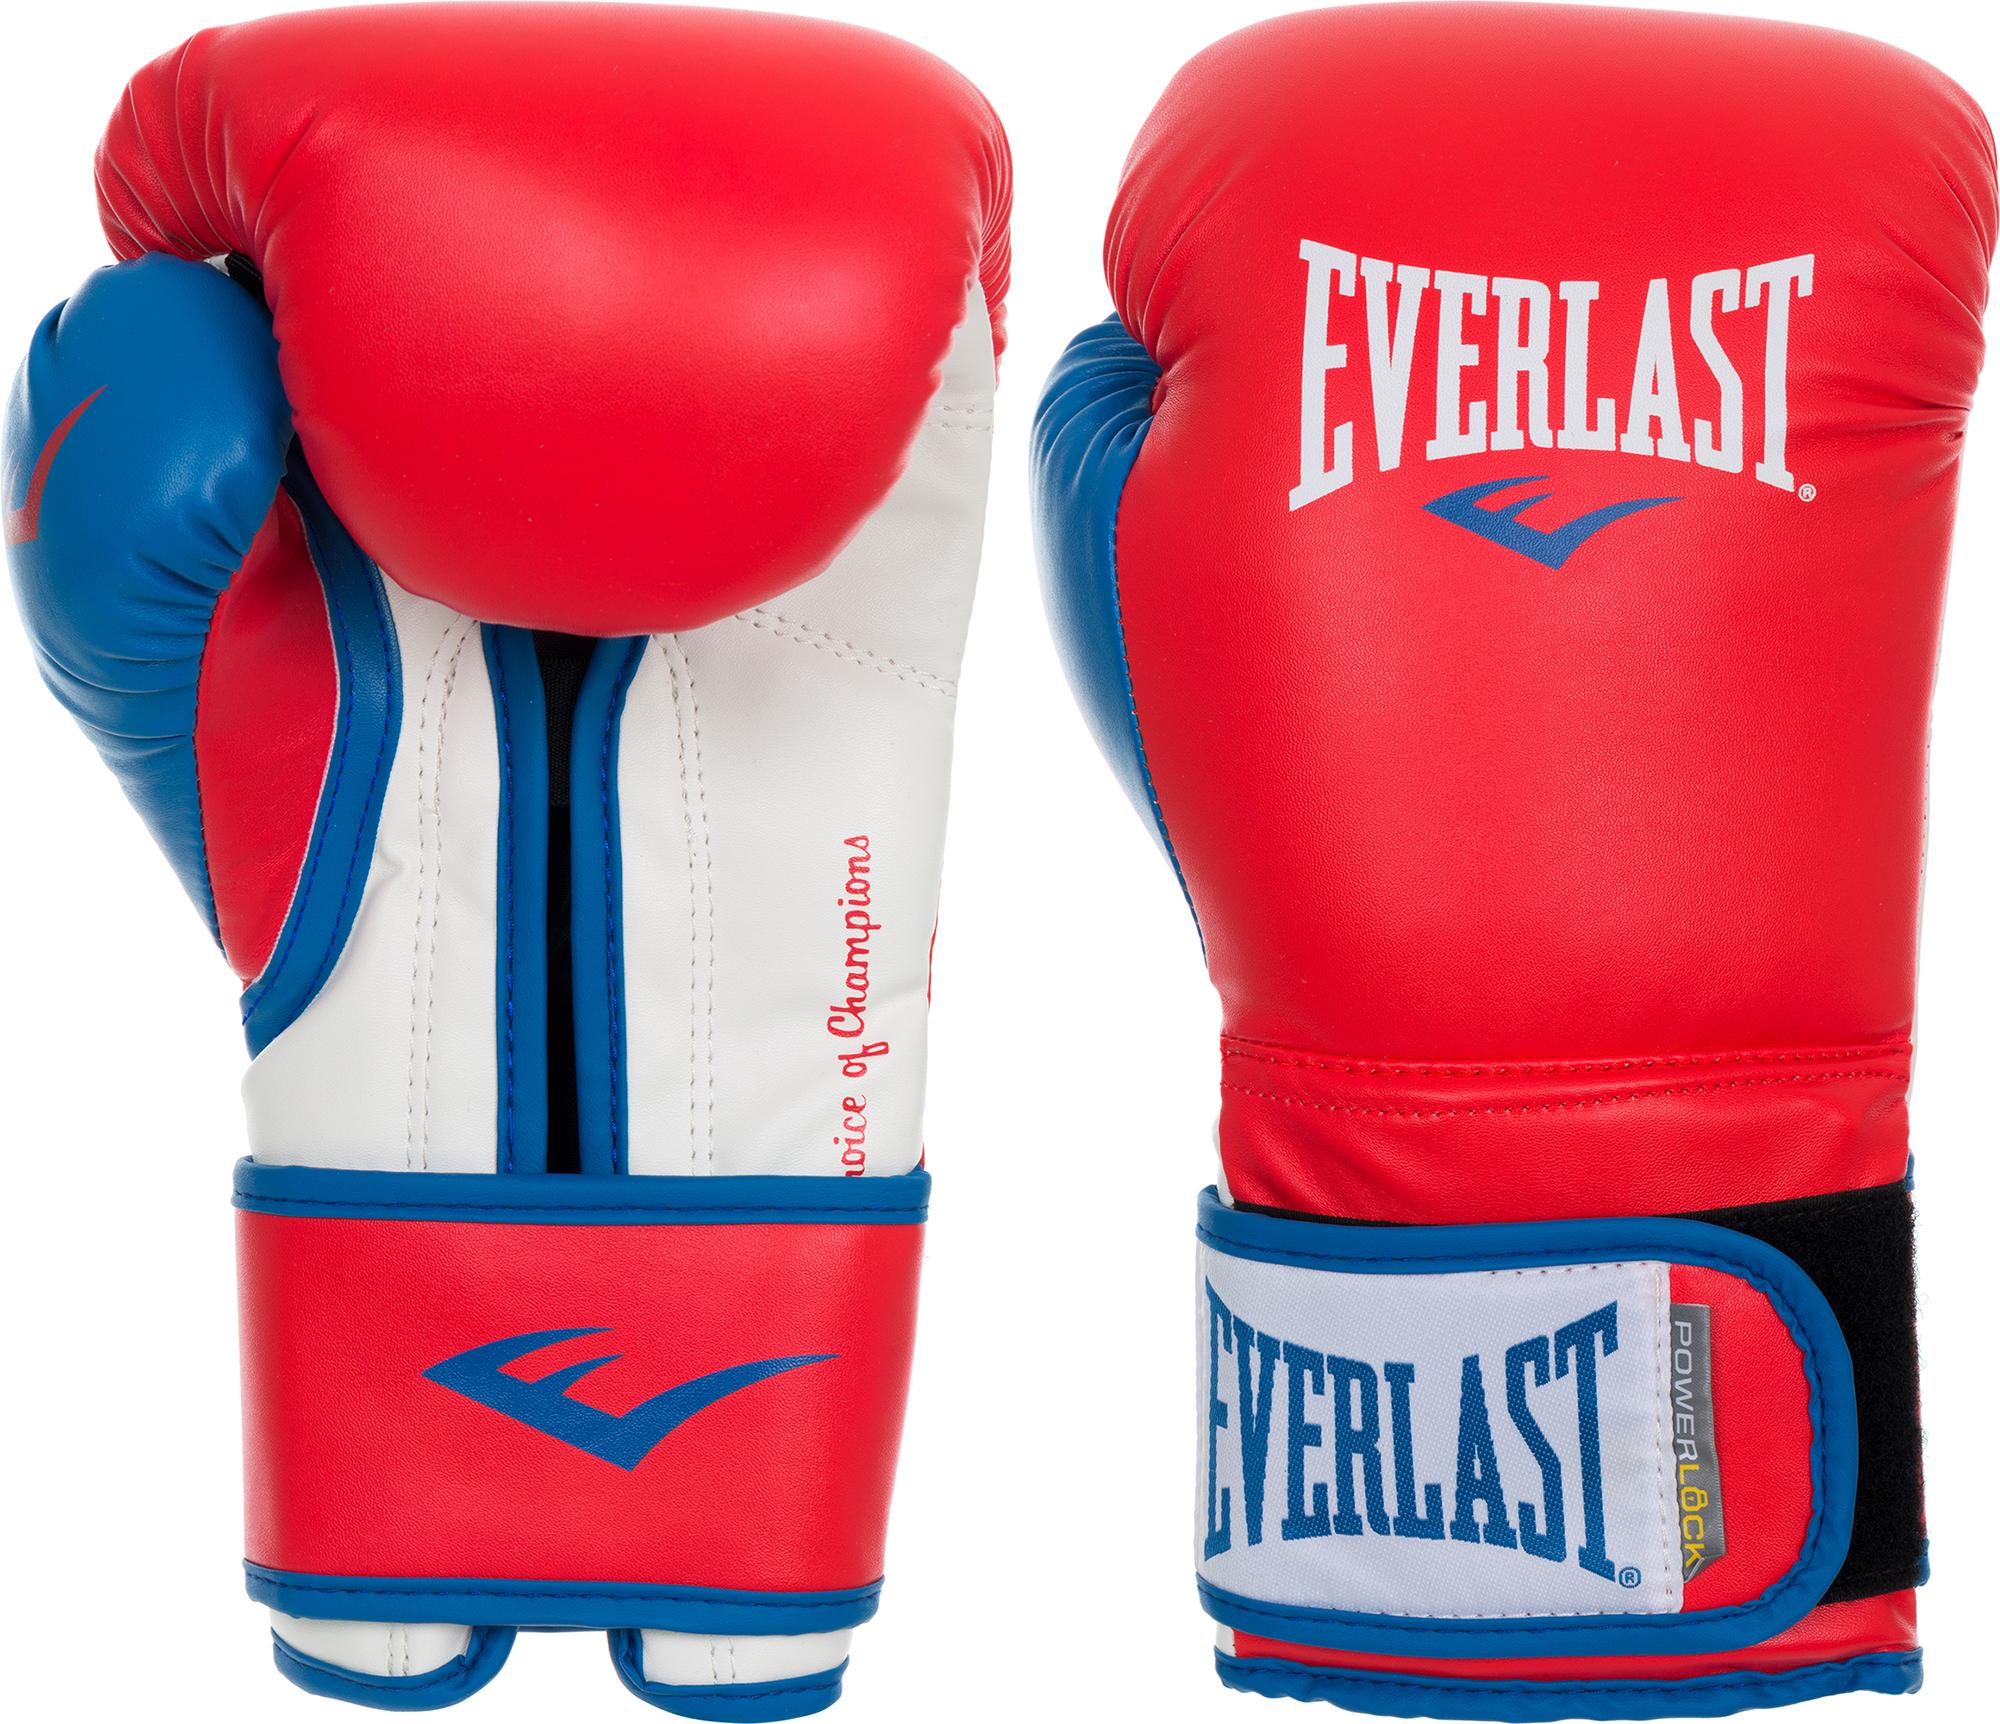 Everlast Перчатки боксерские Everlast Powerlock, размер 16 oz цена